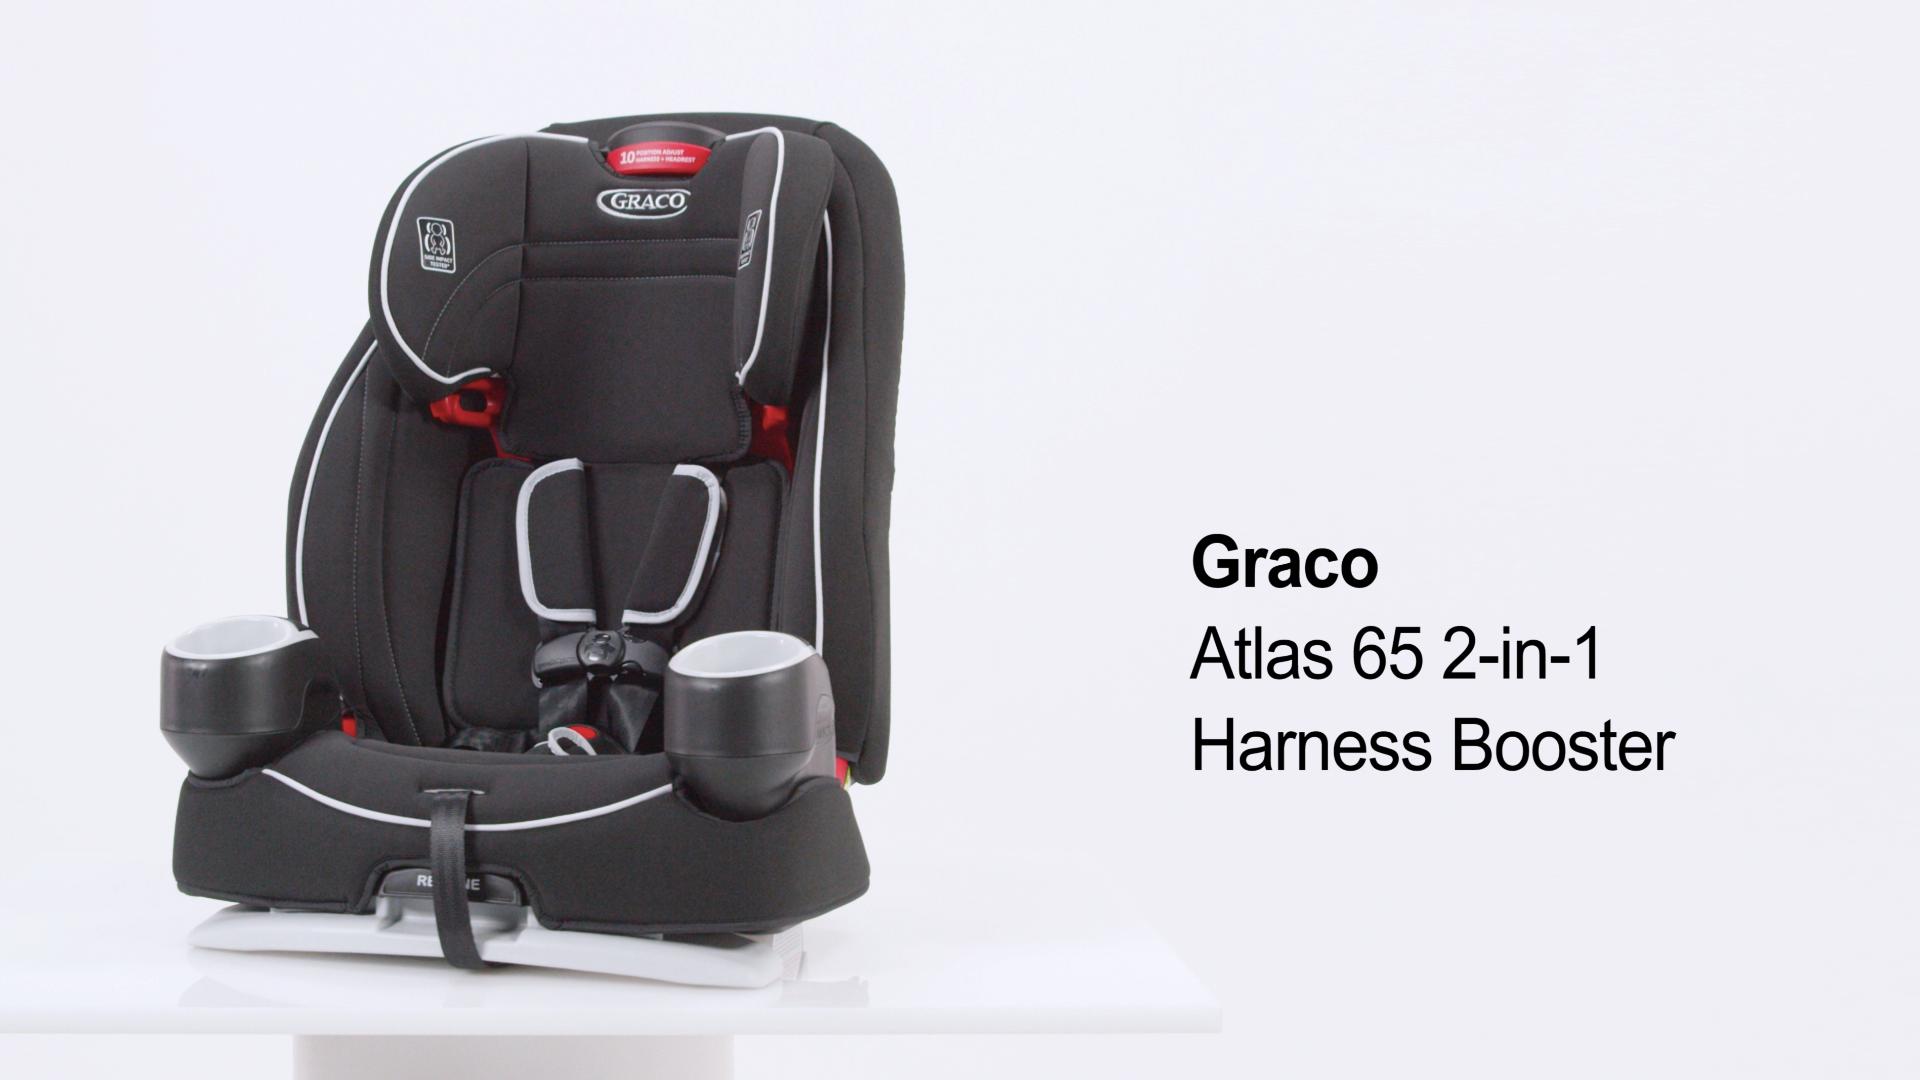 Graco Atlas 65 2 In 1 Harness Booster